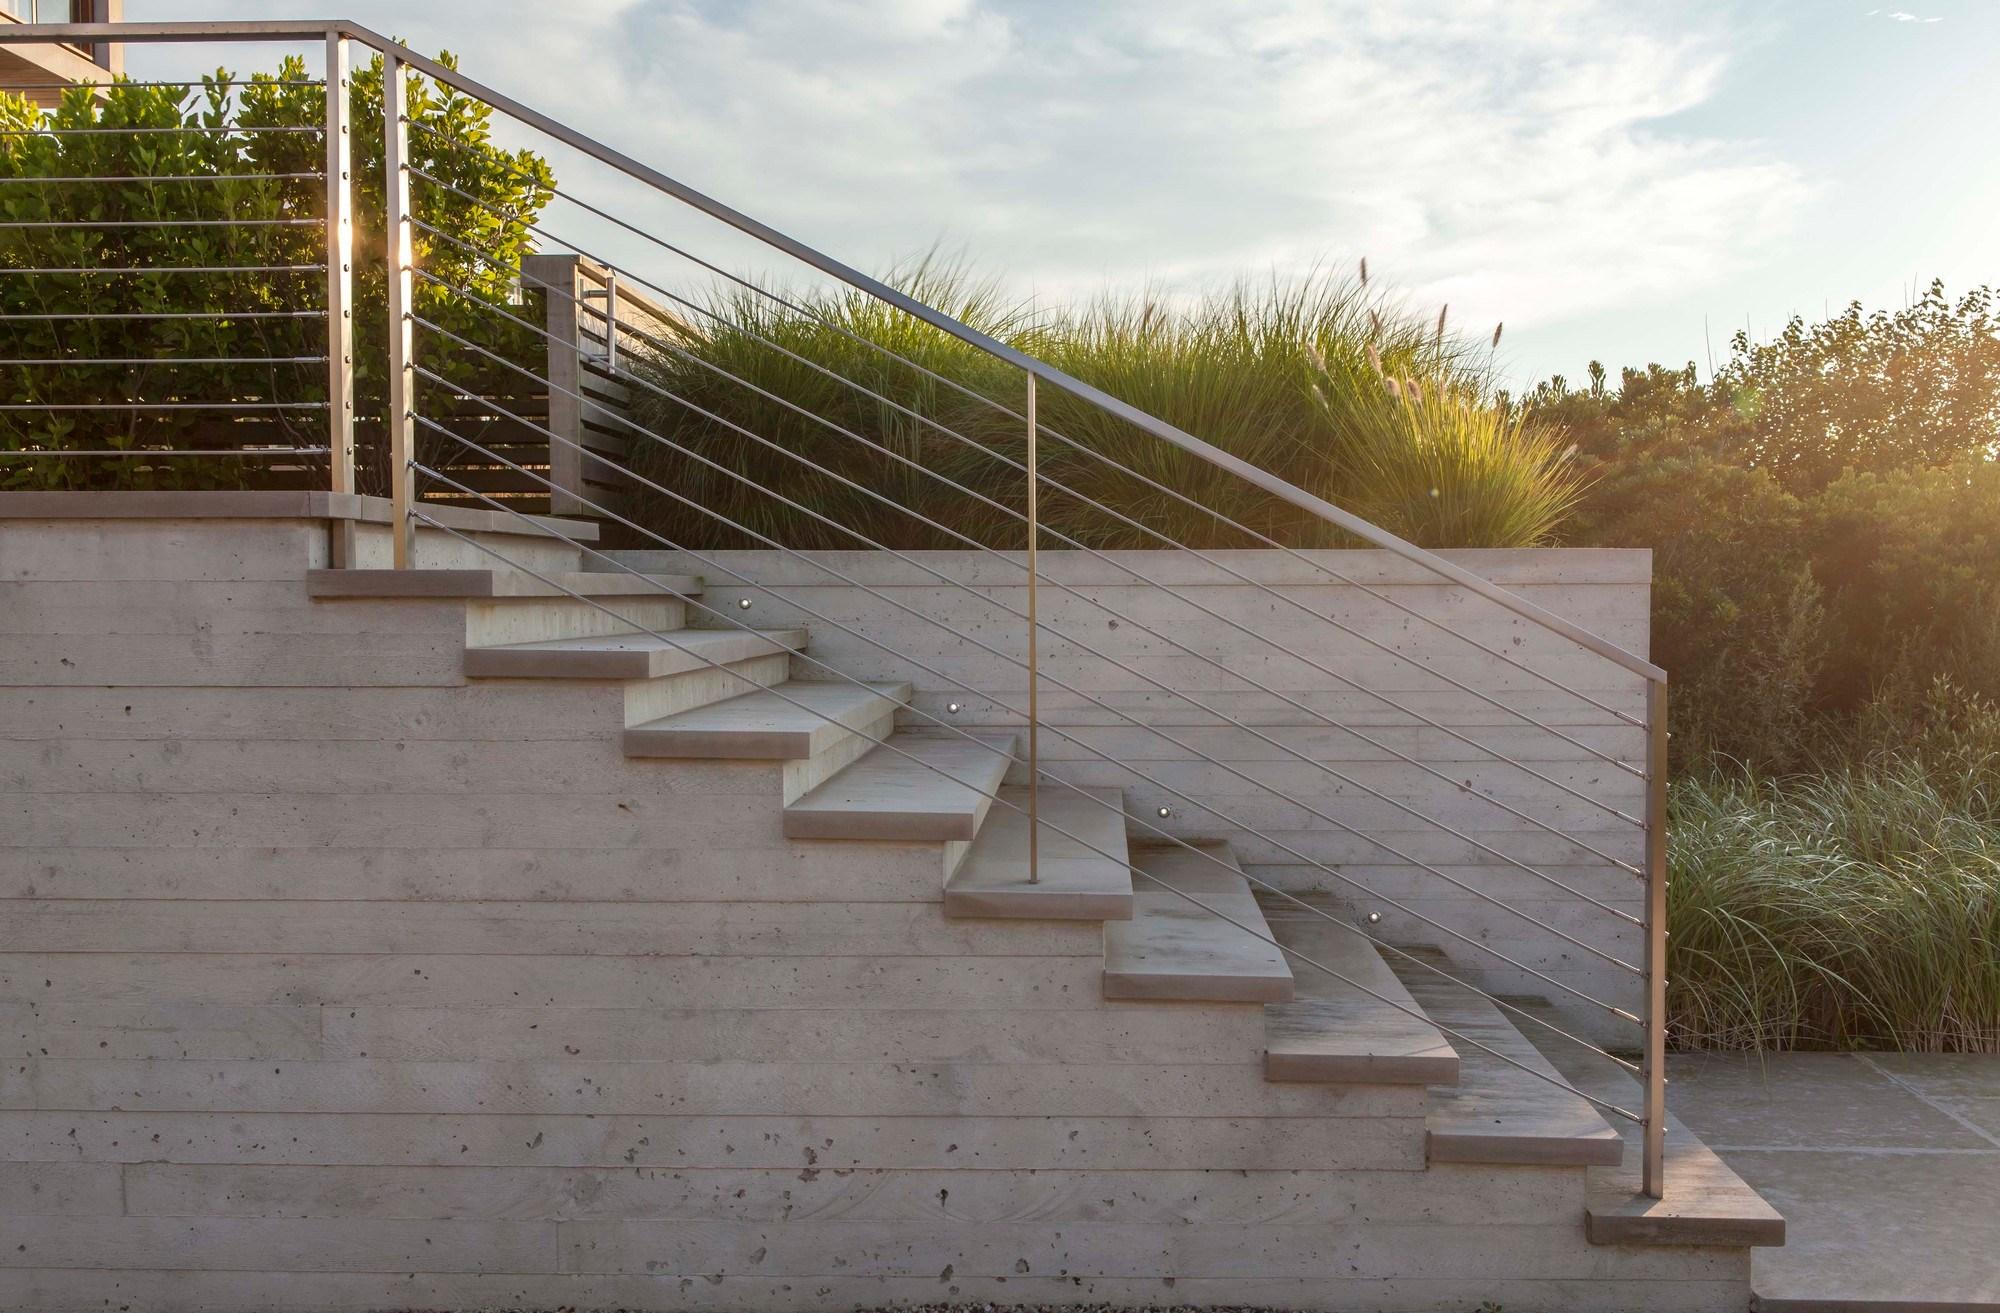 Modern Concrete Stairs Design Outdoor | Modern Stairs Design Outdoor | Indoor | Prefab Metal Residential Exterior | Terrace | Metal | Railing